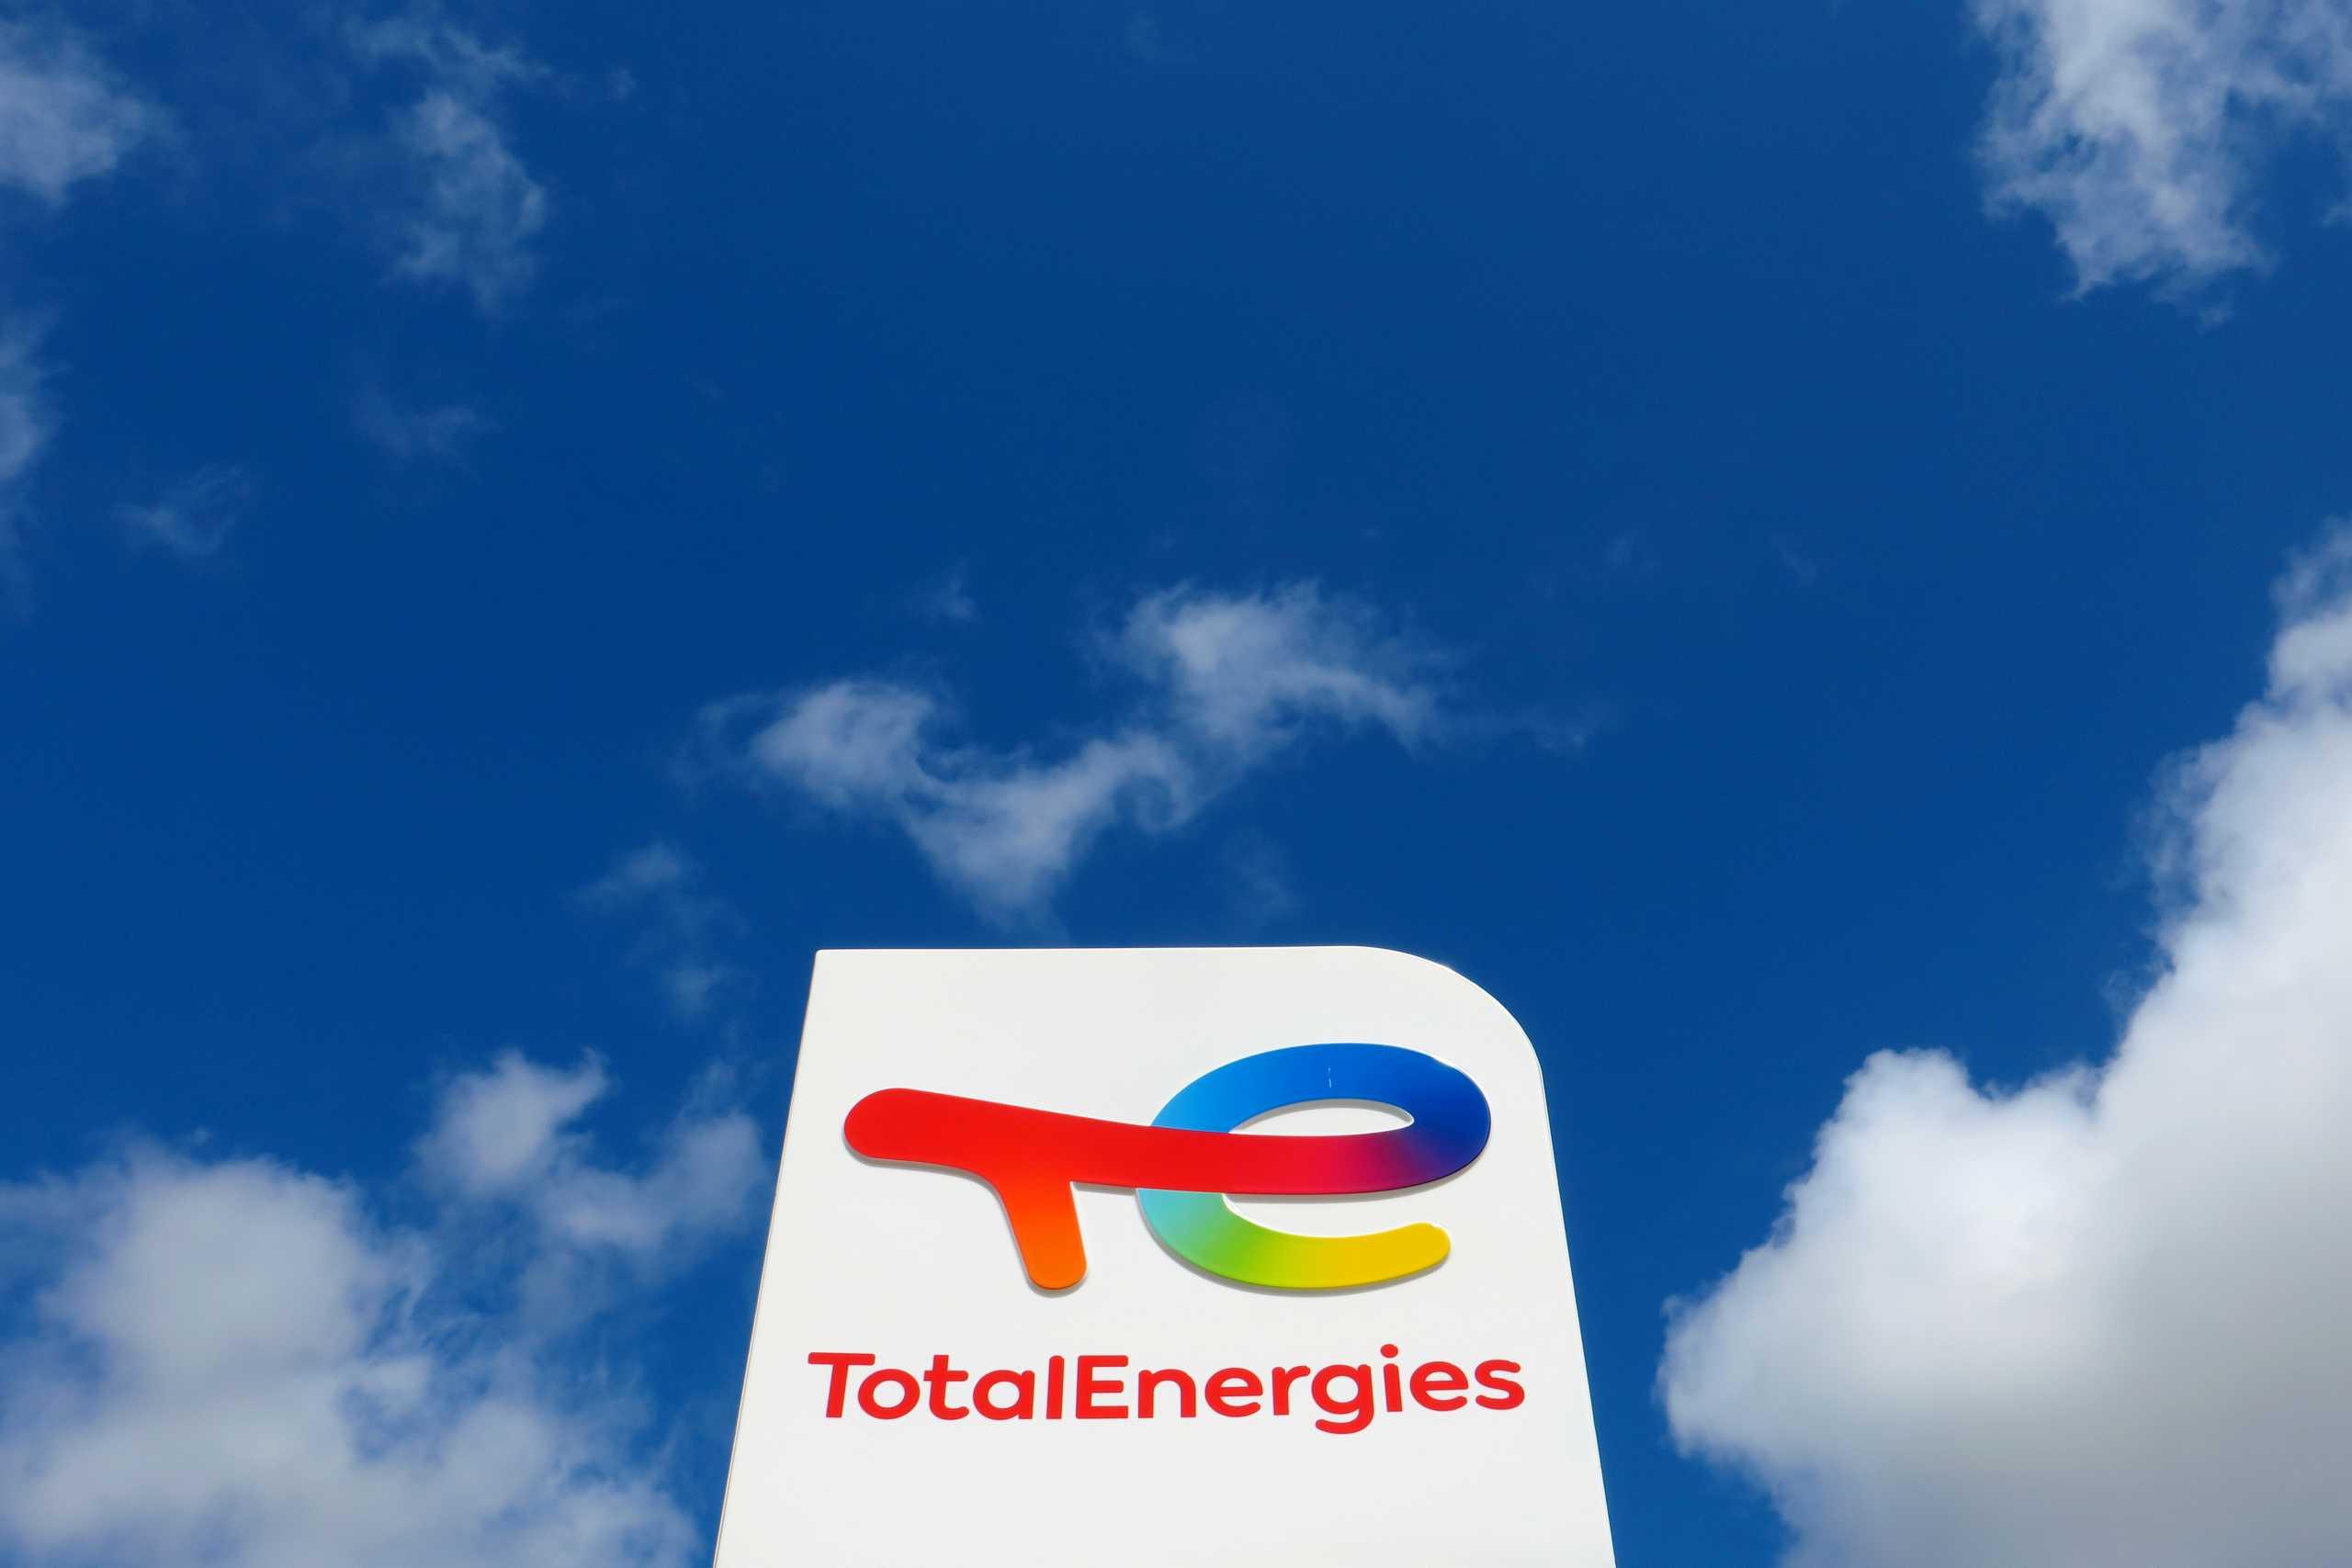 TotalEnergies: Υπέγραψε συμβόλαιο μαμούθ ύψους 27 δισεκ. δολαρίων με το Ιράκ